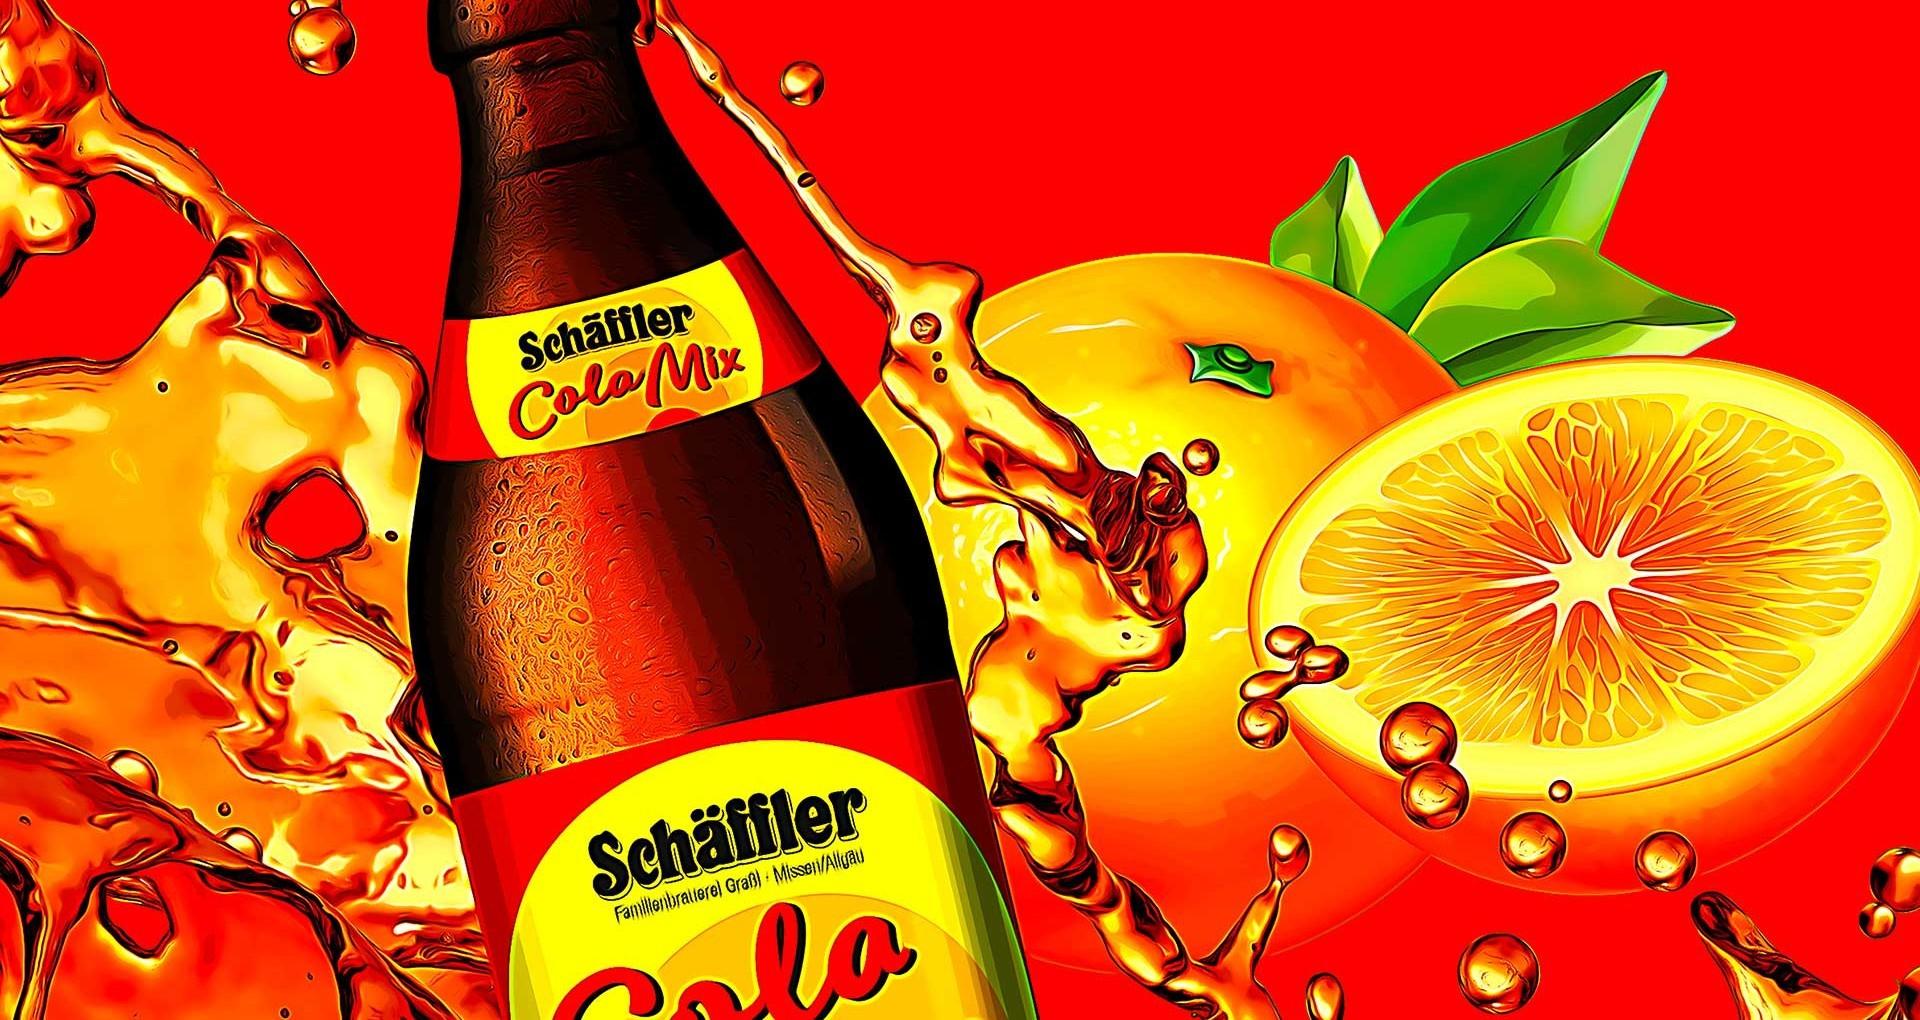 Schäffler Cola-Mix